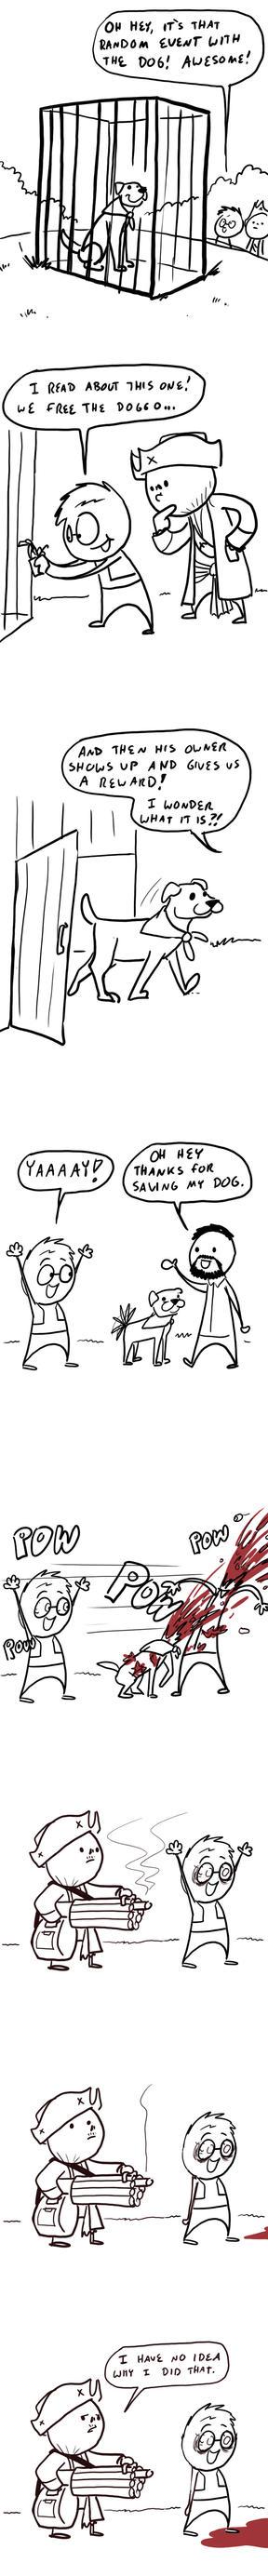 Fallout Comics 21: Dog Rescue by RomanJones